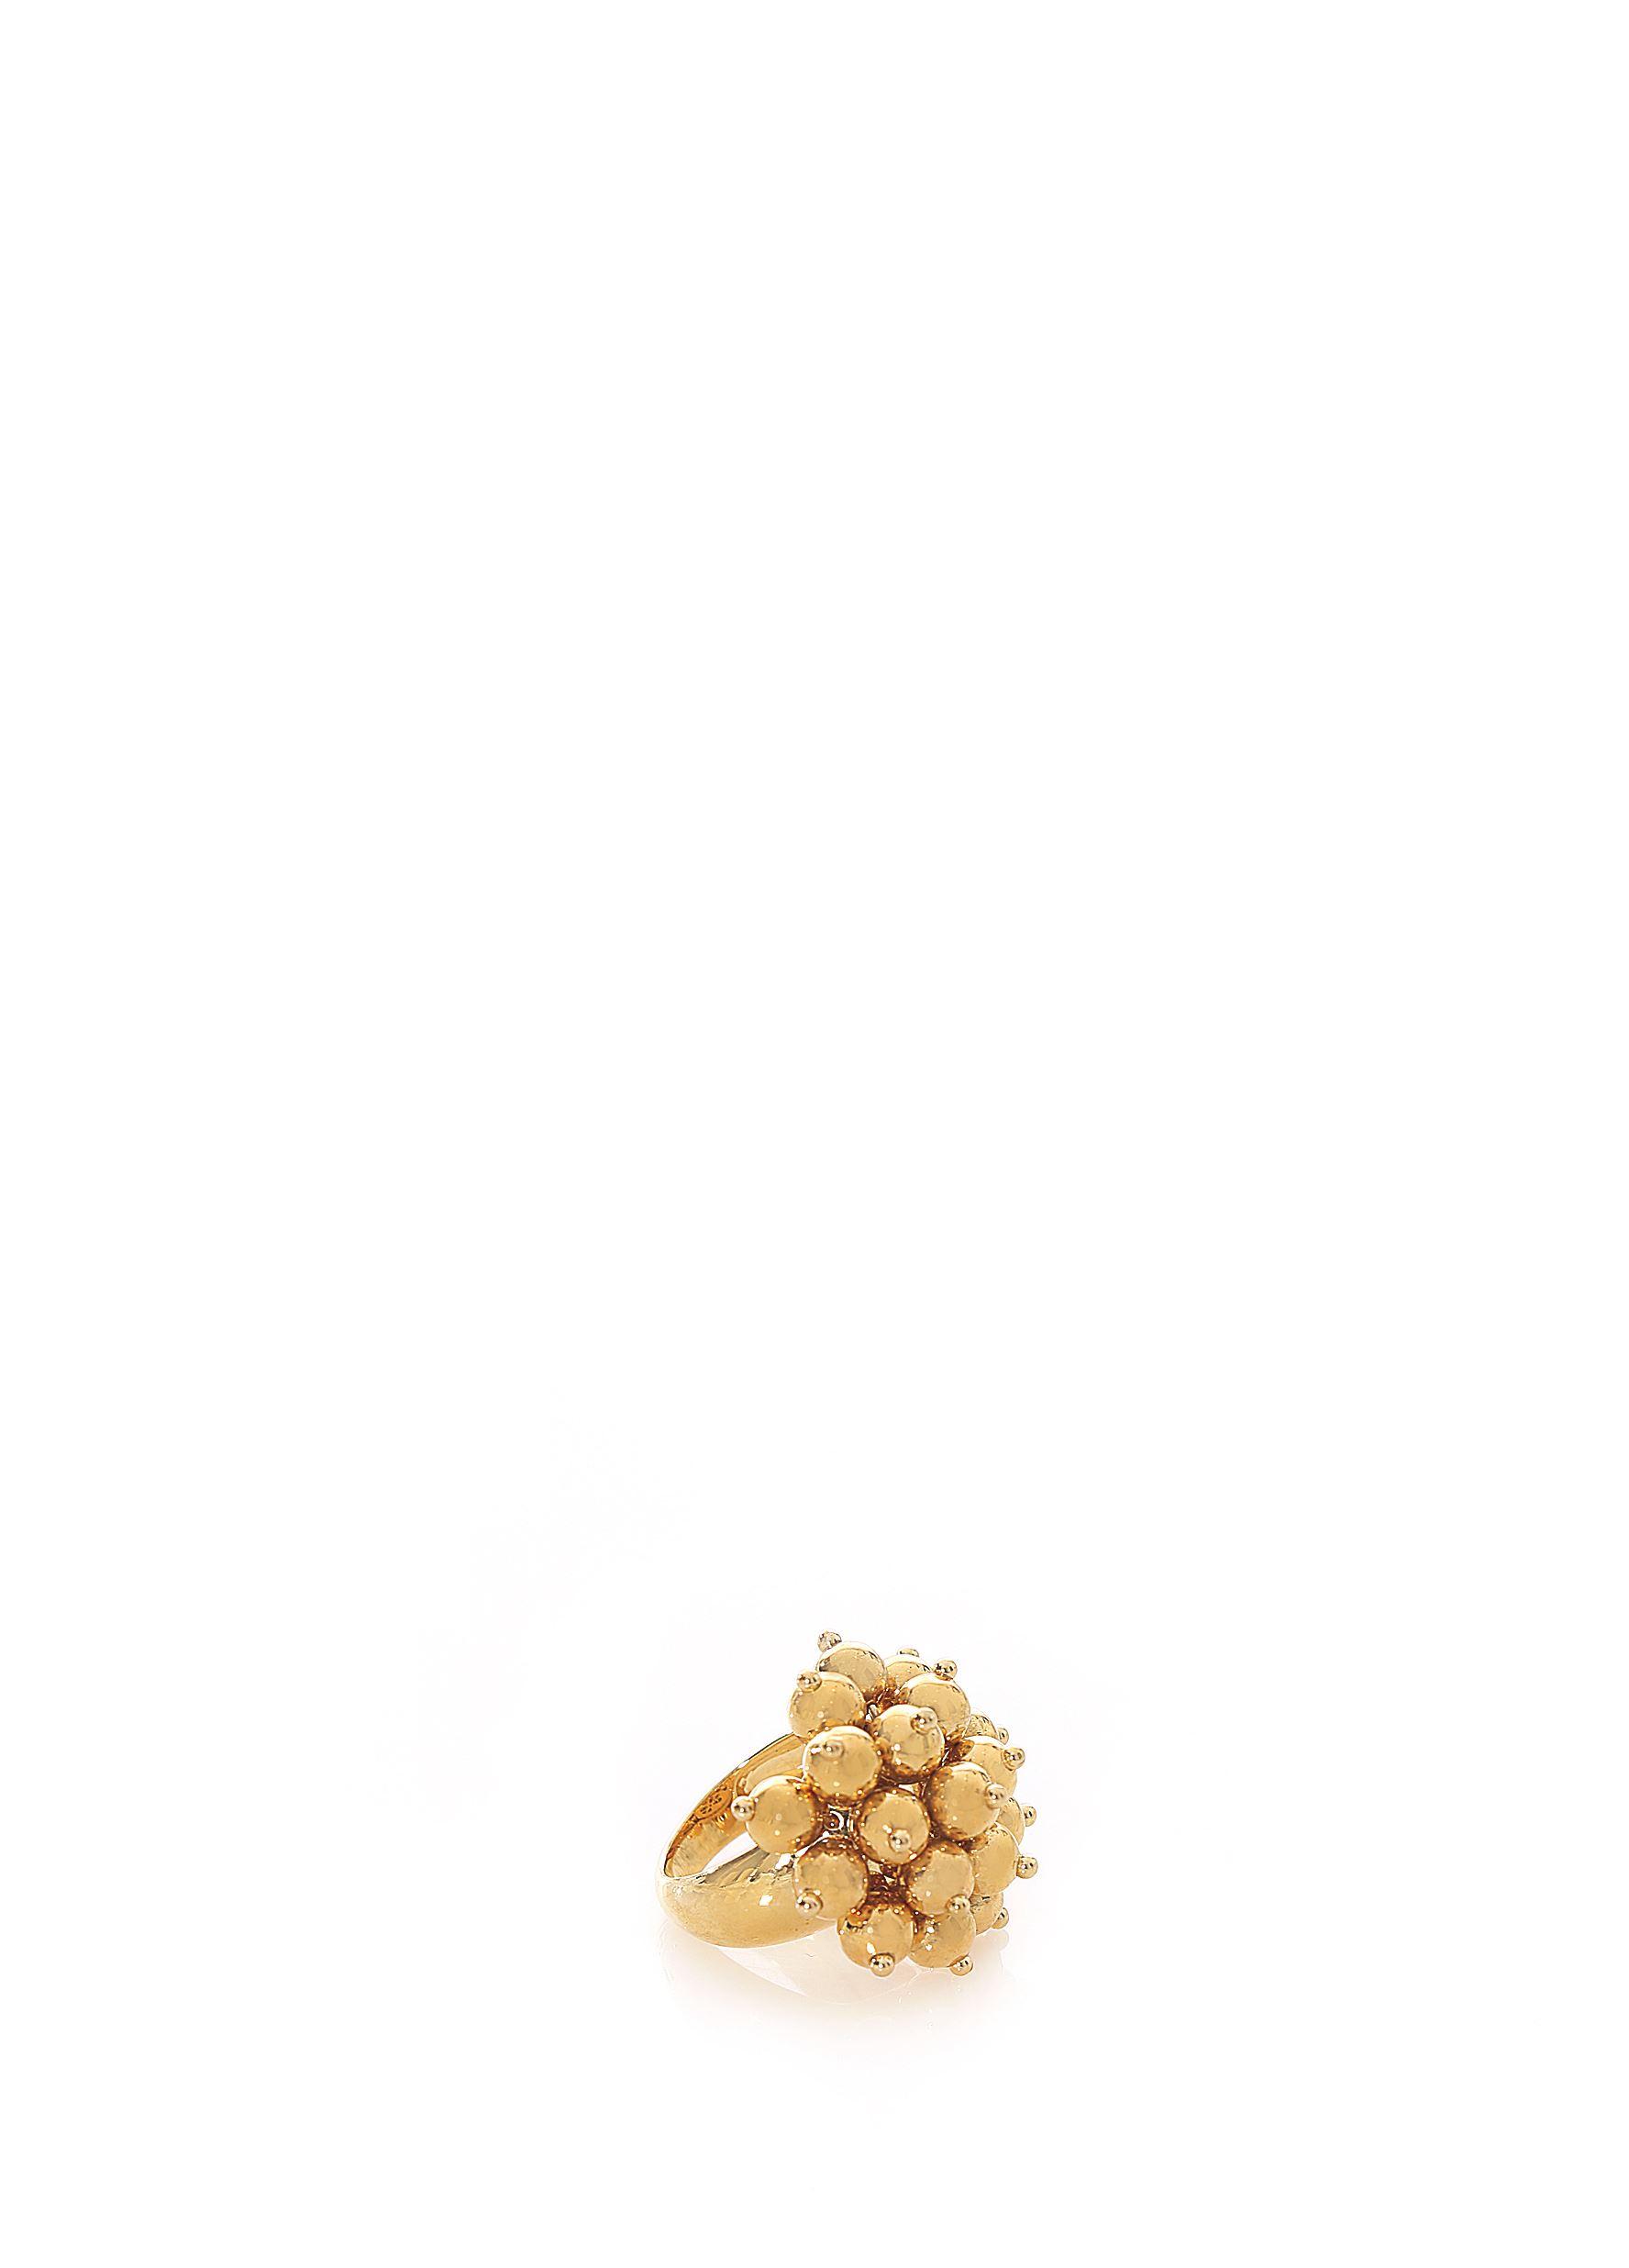 Tommy Hilfiger Accessories - Γυναικείο Δαχτυλίδι TOMMY HILFIGER με χάνδρες